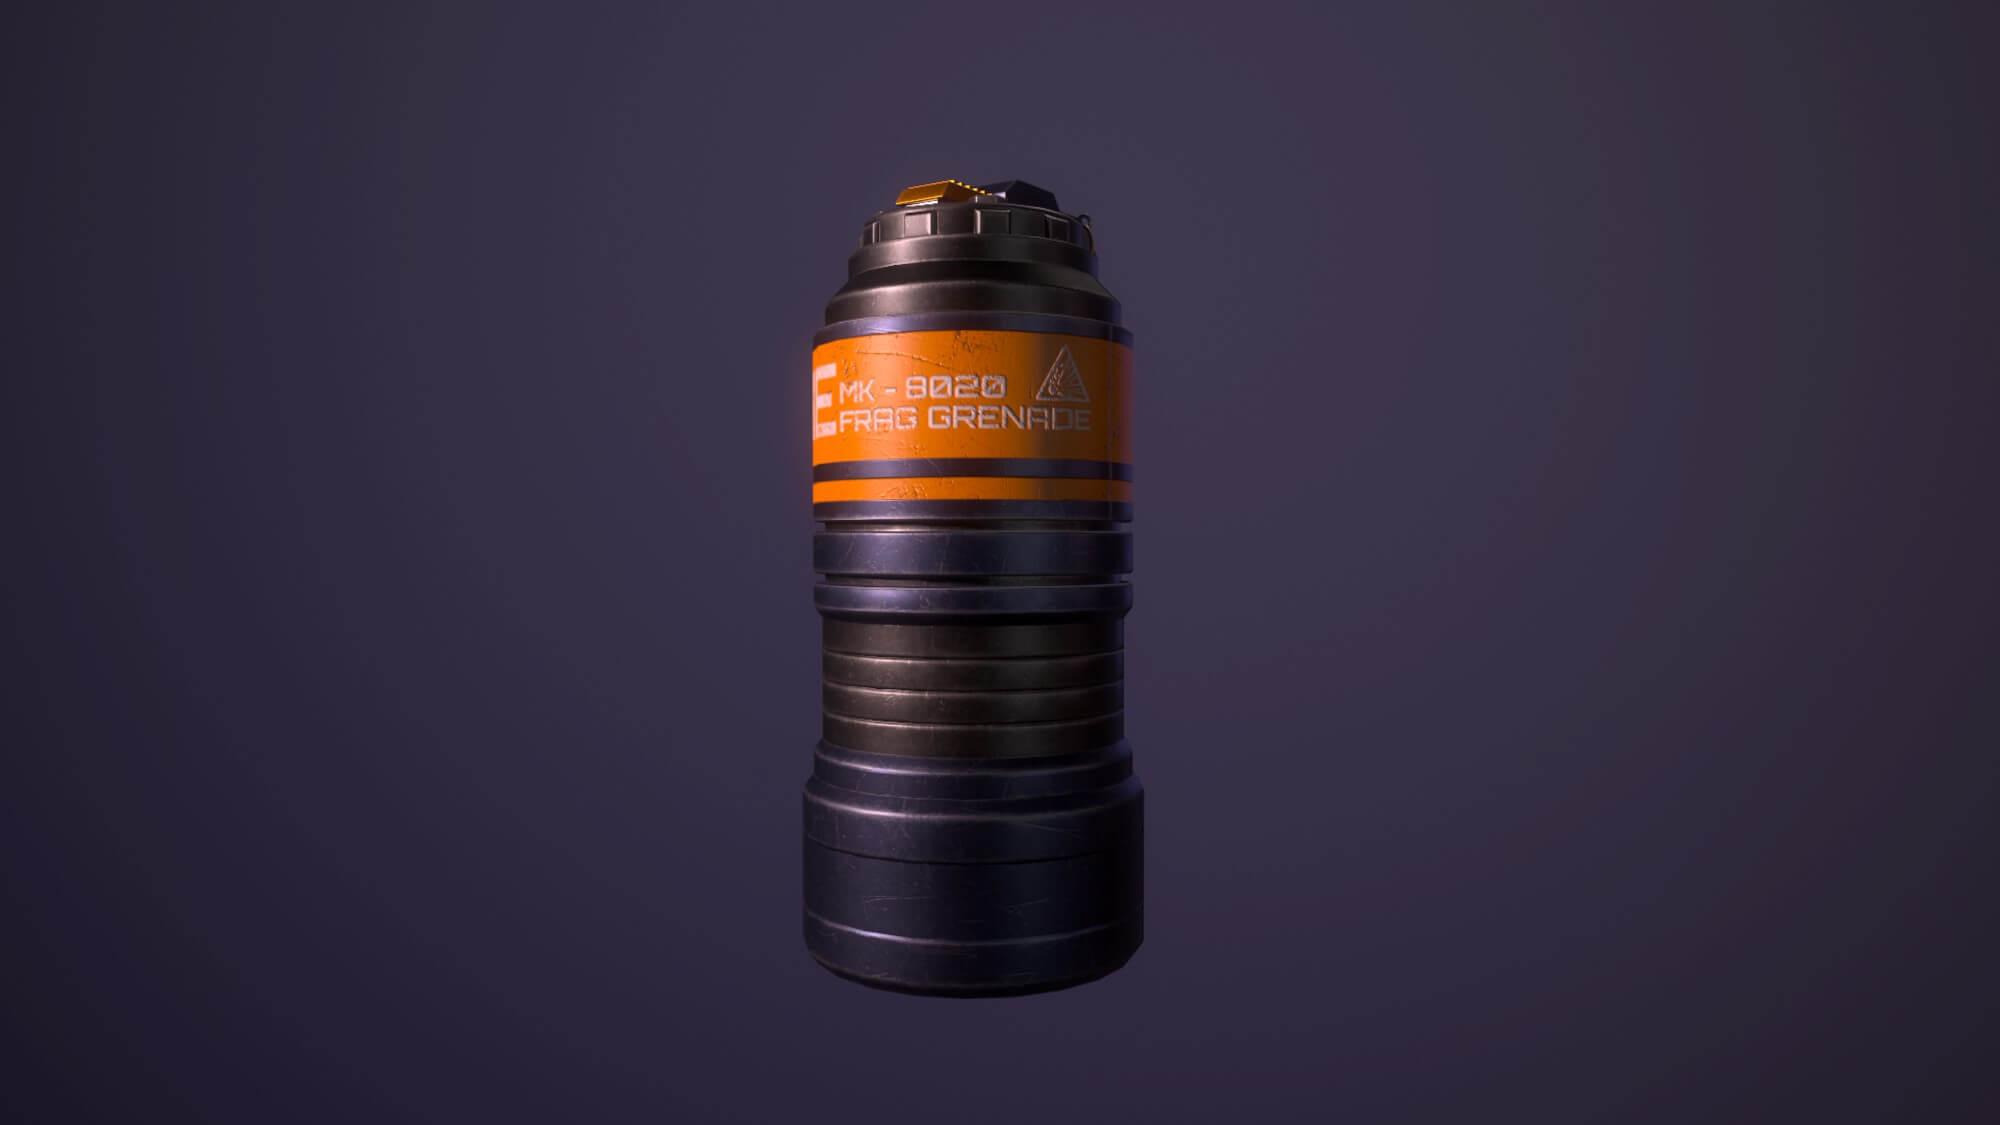 a cylindrical frag grenade